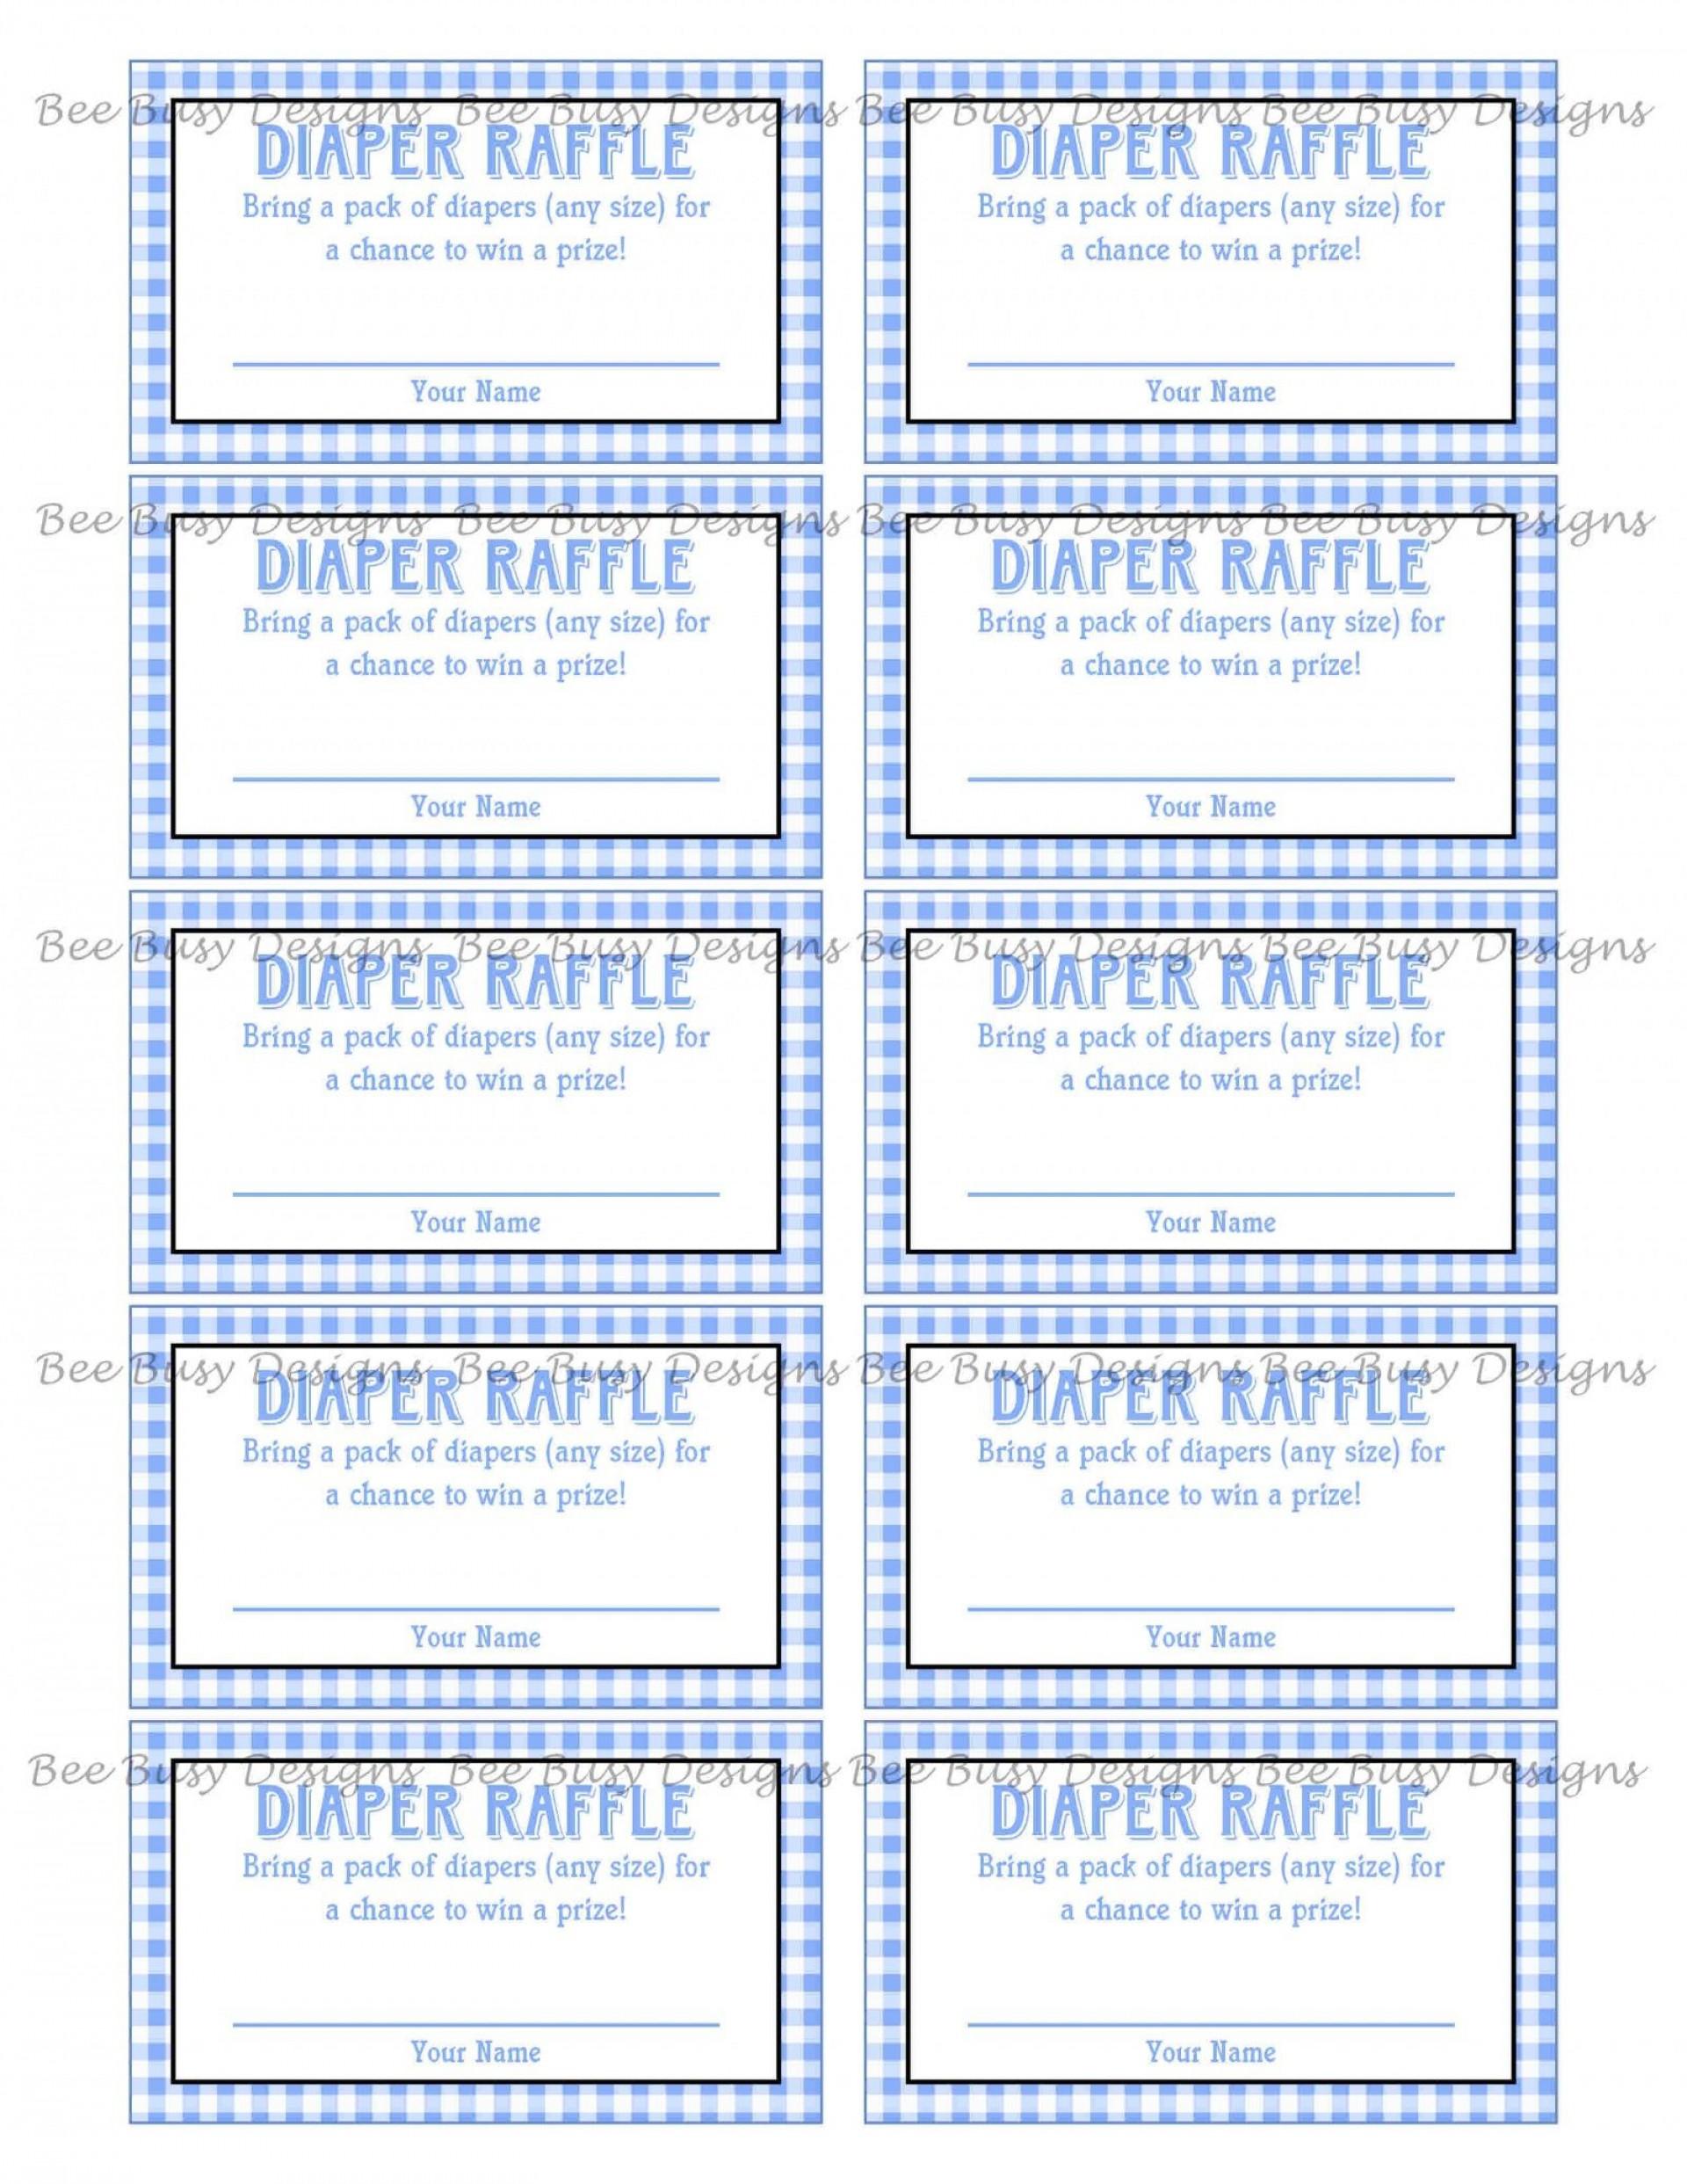 006 Marvelou Diaper Raffle Ticket Template Sample  Boy Free Printable Print Black And White1920